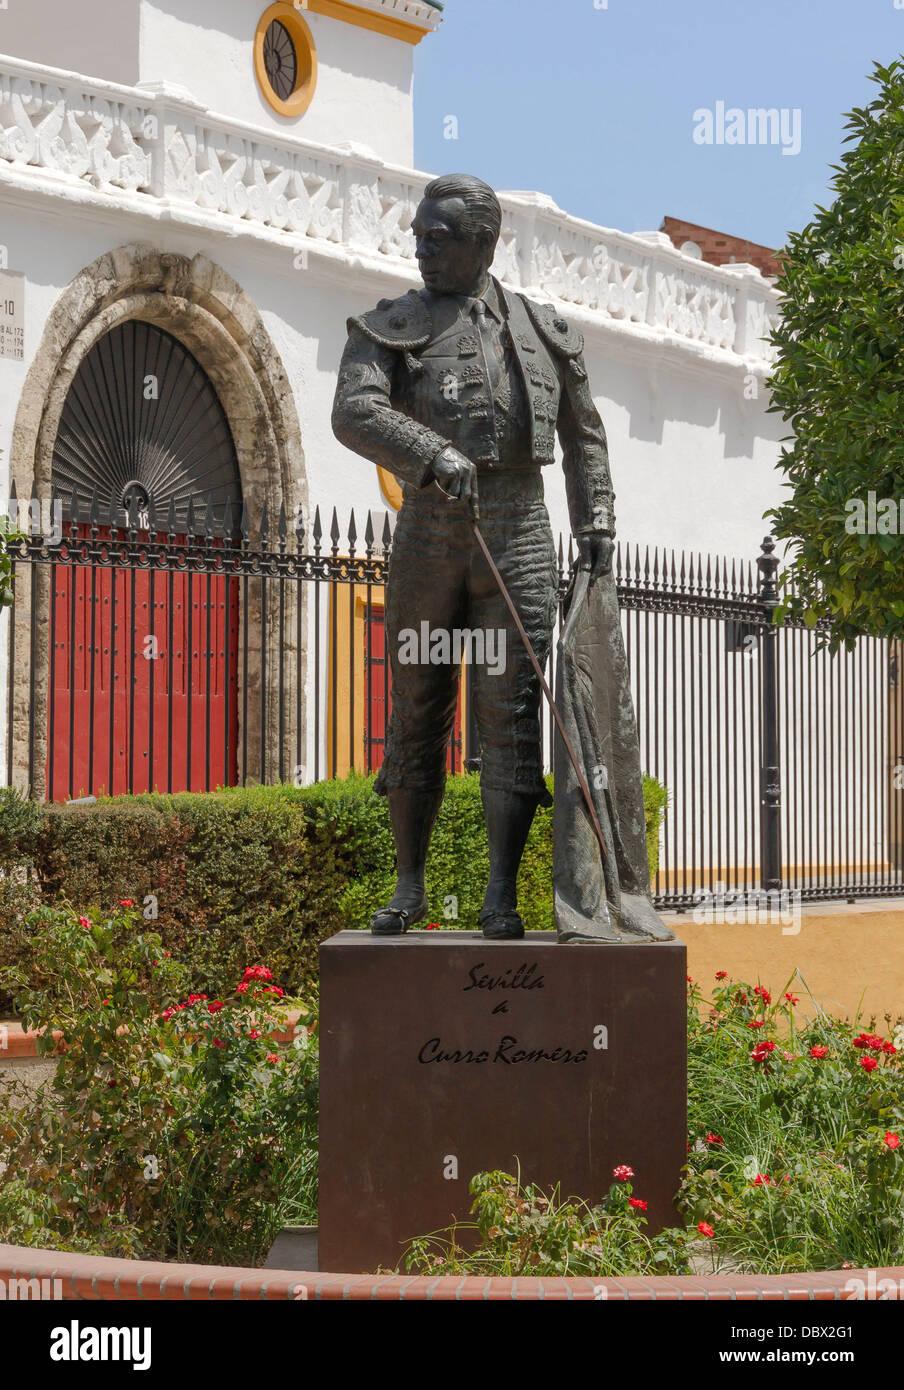 Bronze statue to Curro Romero, by Sebastian Santos Calero, close the bullring of the Real Maestranza de Caballeria - Stock Image